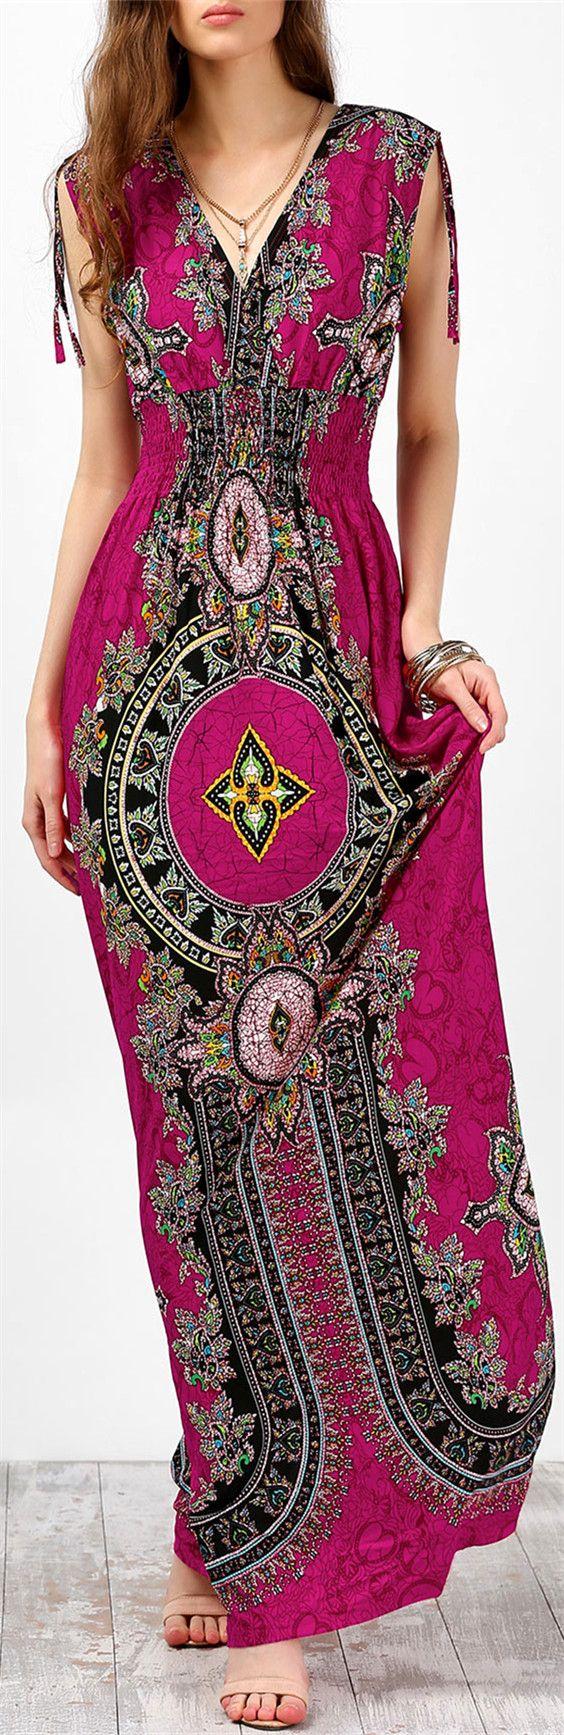 $23.27 Sleeveless Empire Waist Ornate Print Maxi Dress - Rose Red